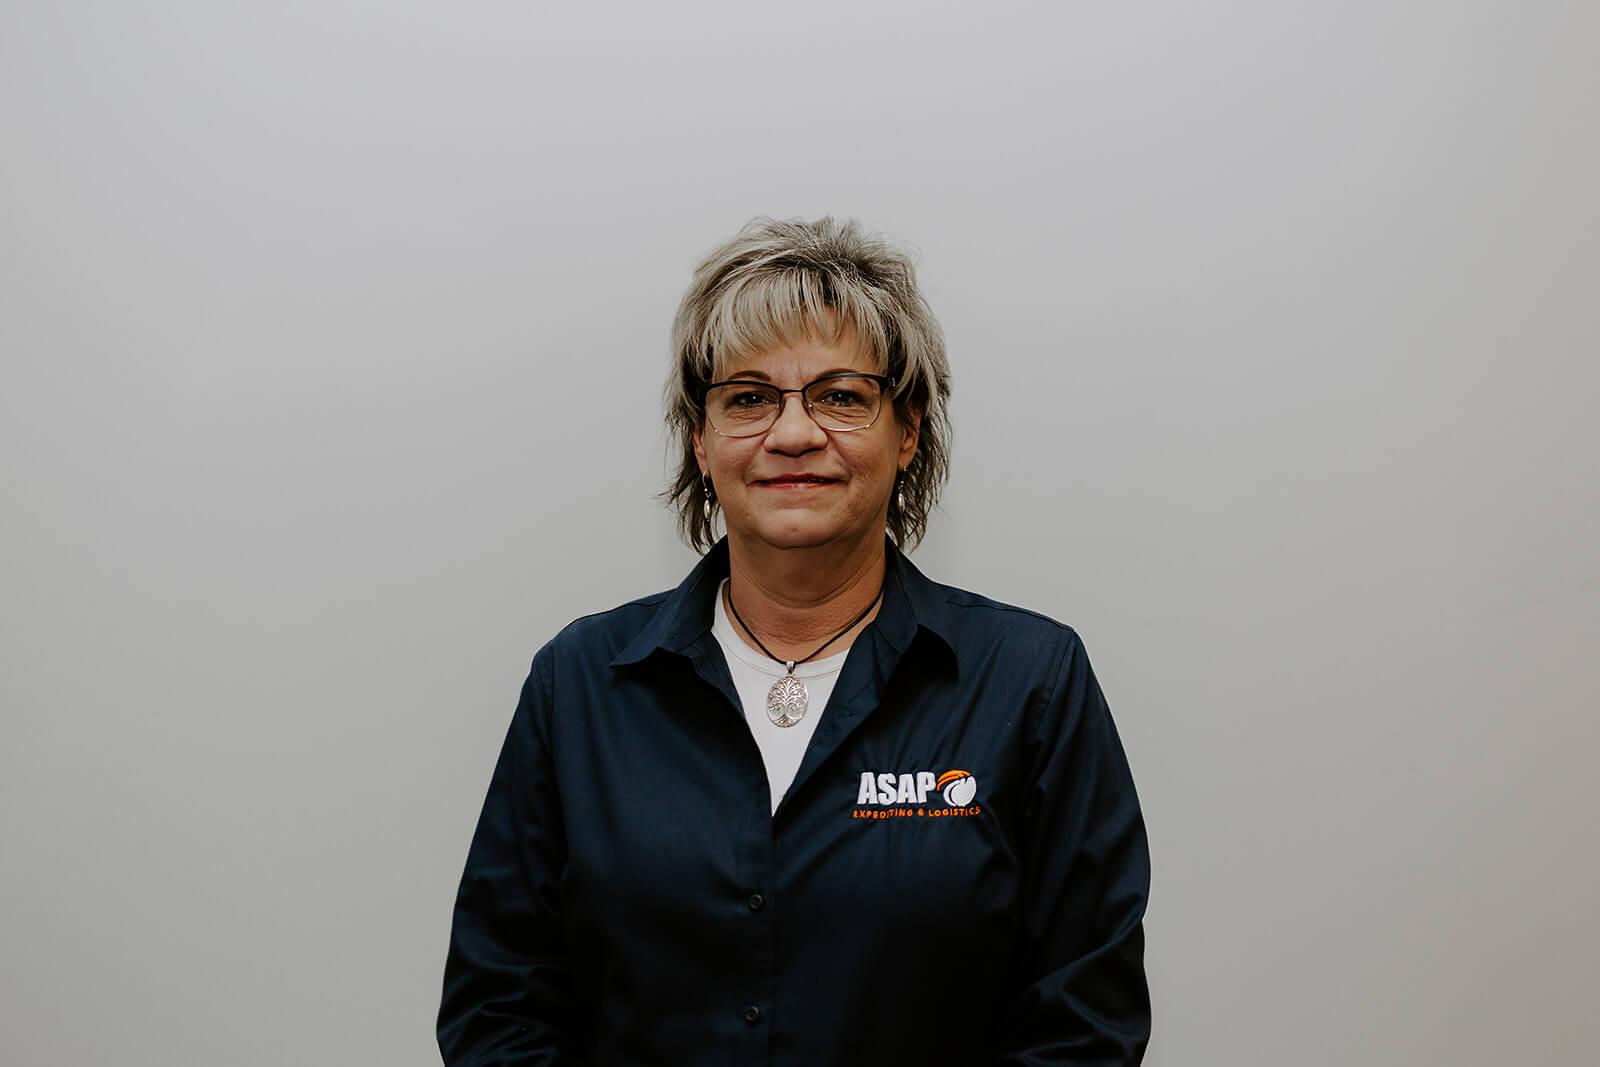 Paula Jeffcoat